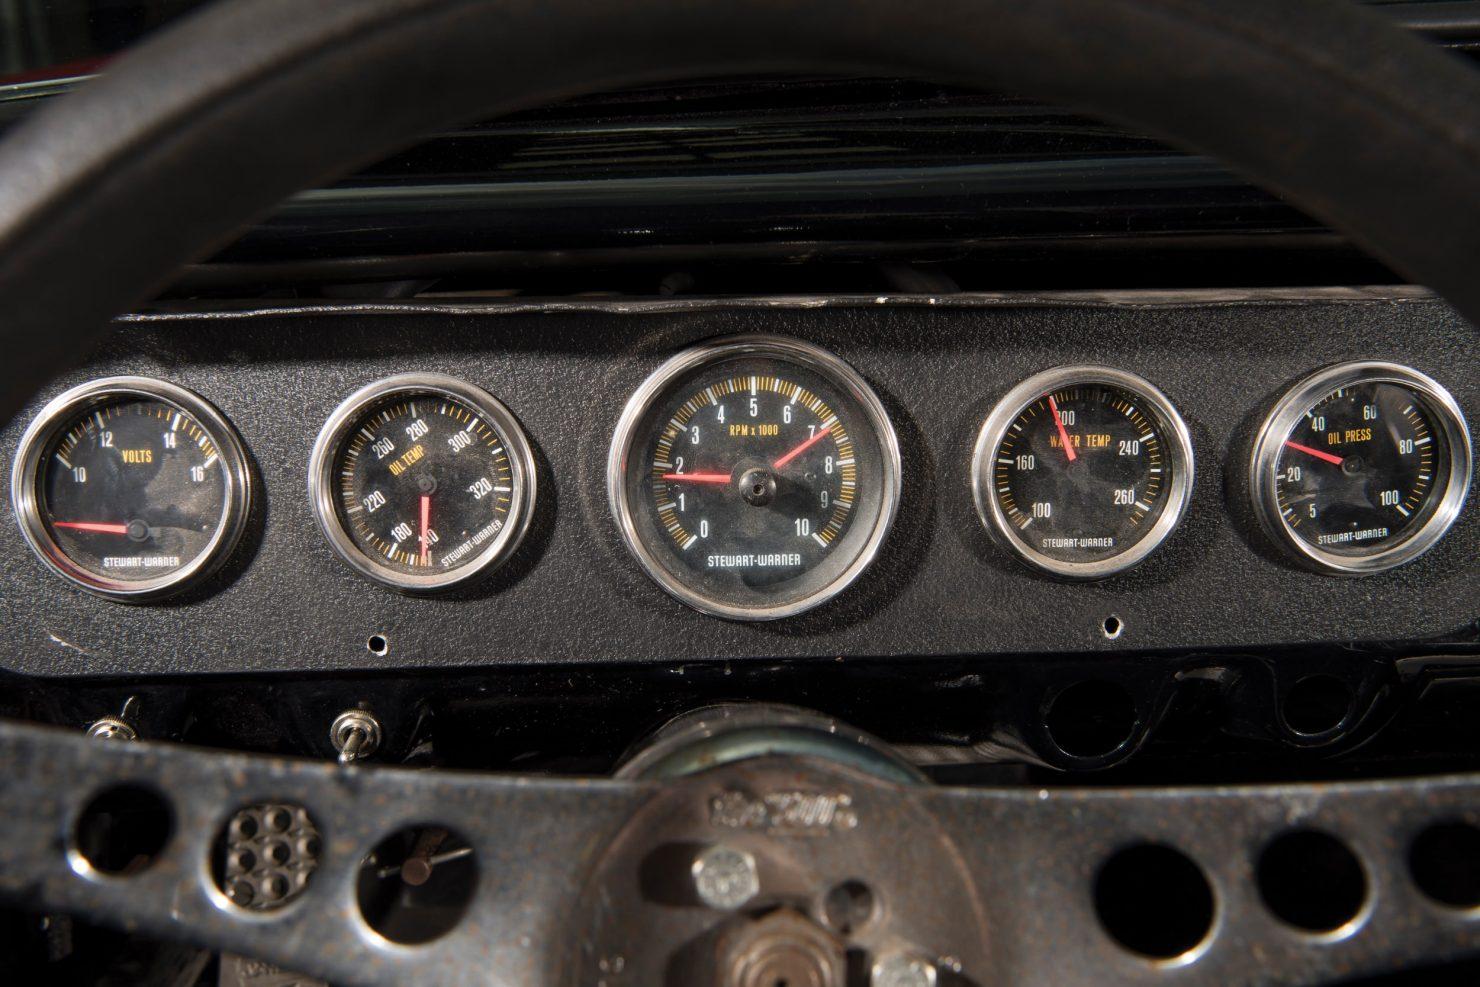 shelby gt350 race car 13 1480x987 - 1966 Shelby GT350 - Period SCCA Race Car